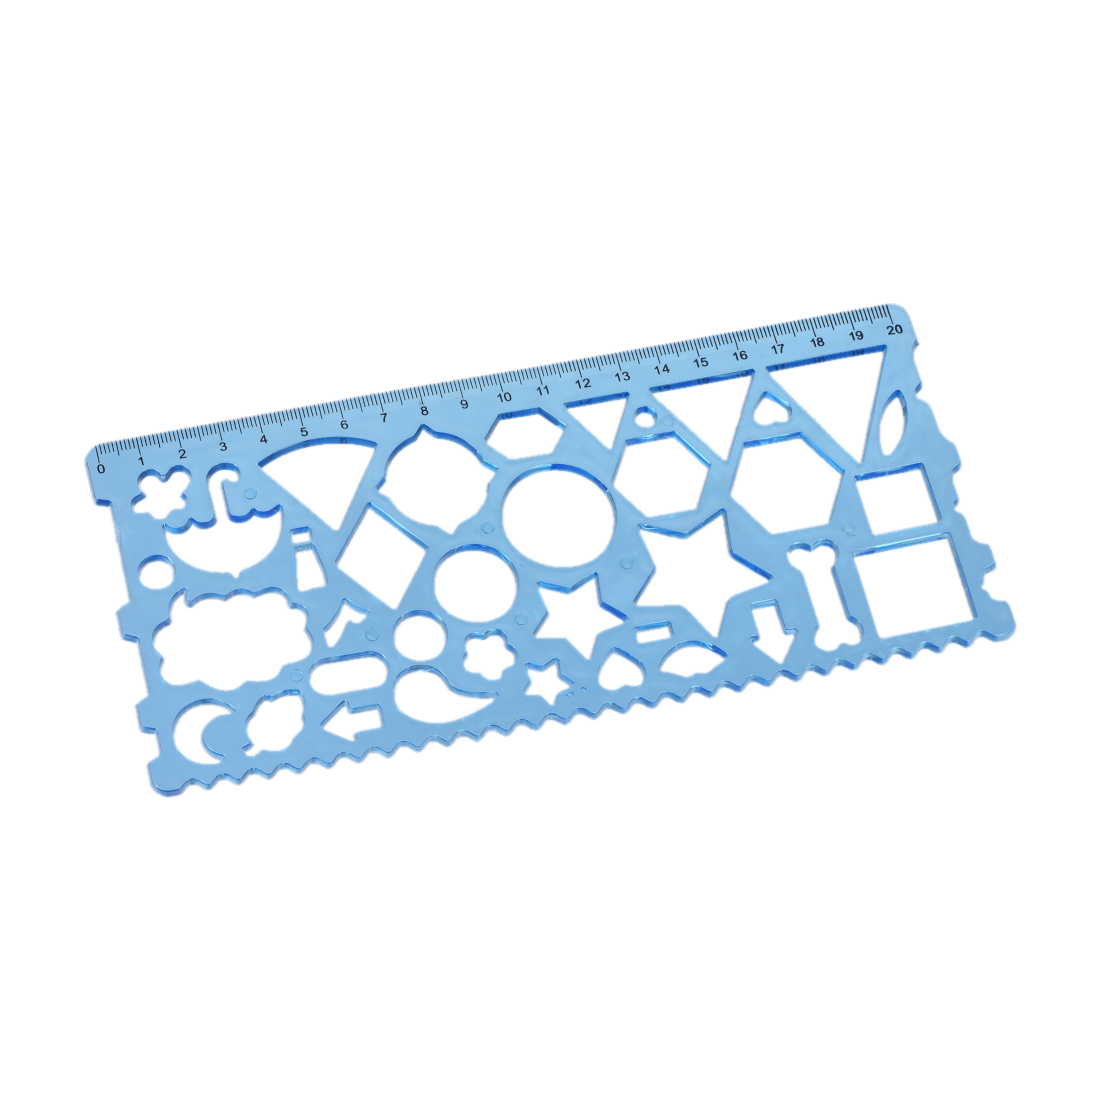 Flexible Geometric Technical Drawing Template Ruler Plastic 20cm for Math